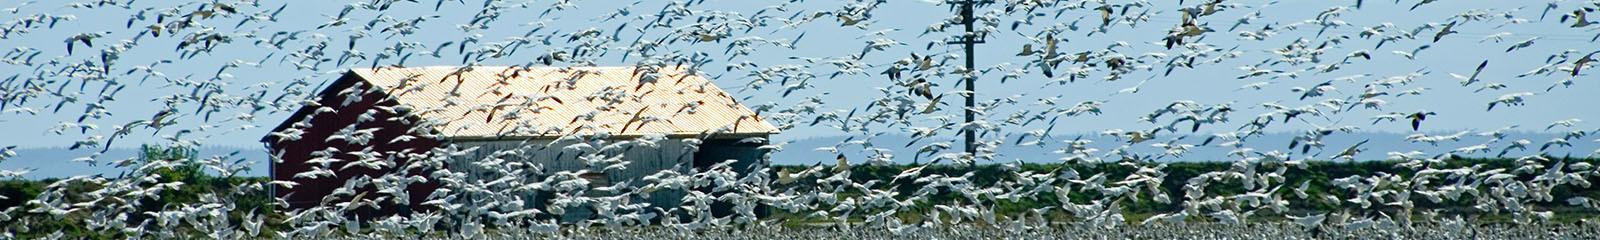 Flock Control